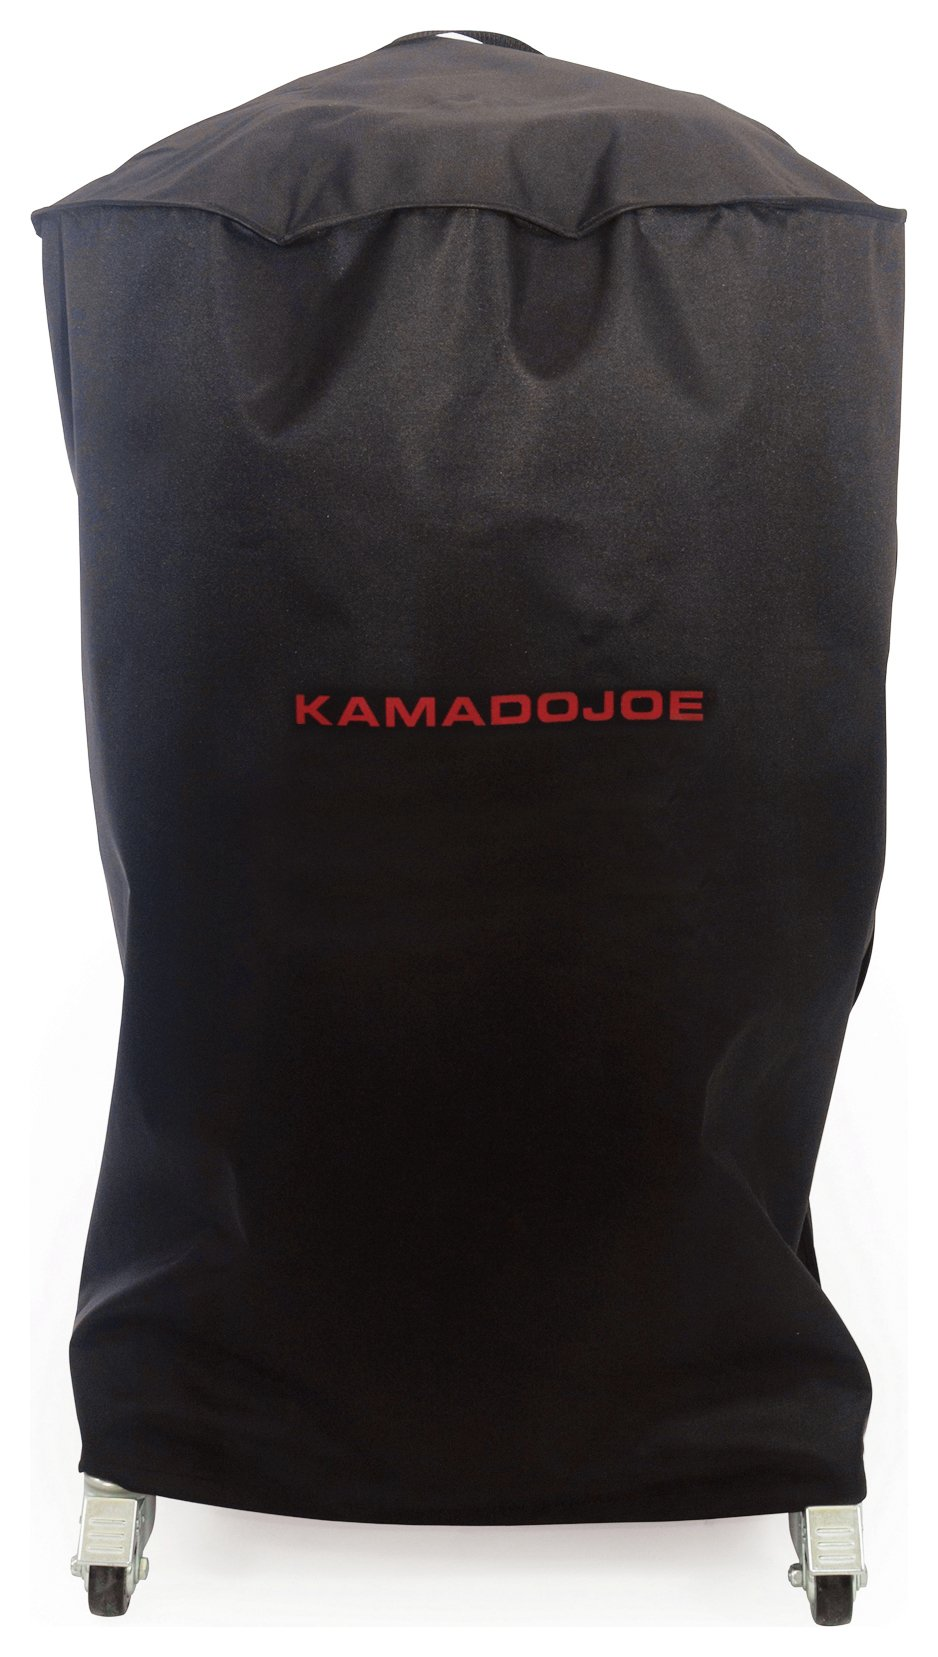 Kamado Joe - Grill - Cover for Classic Joe BBQ lowest price